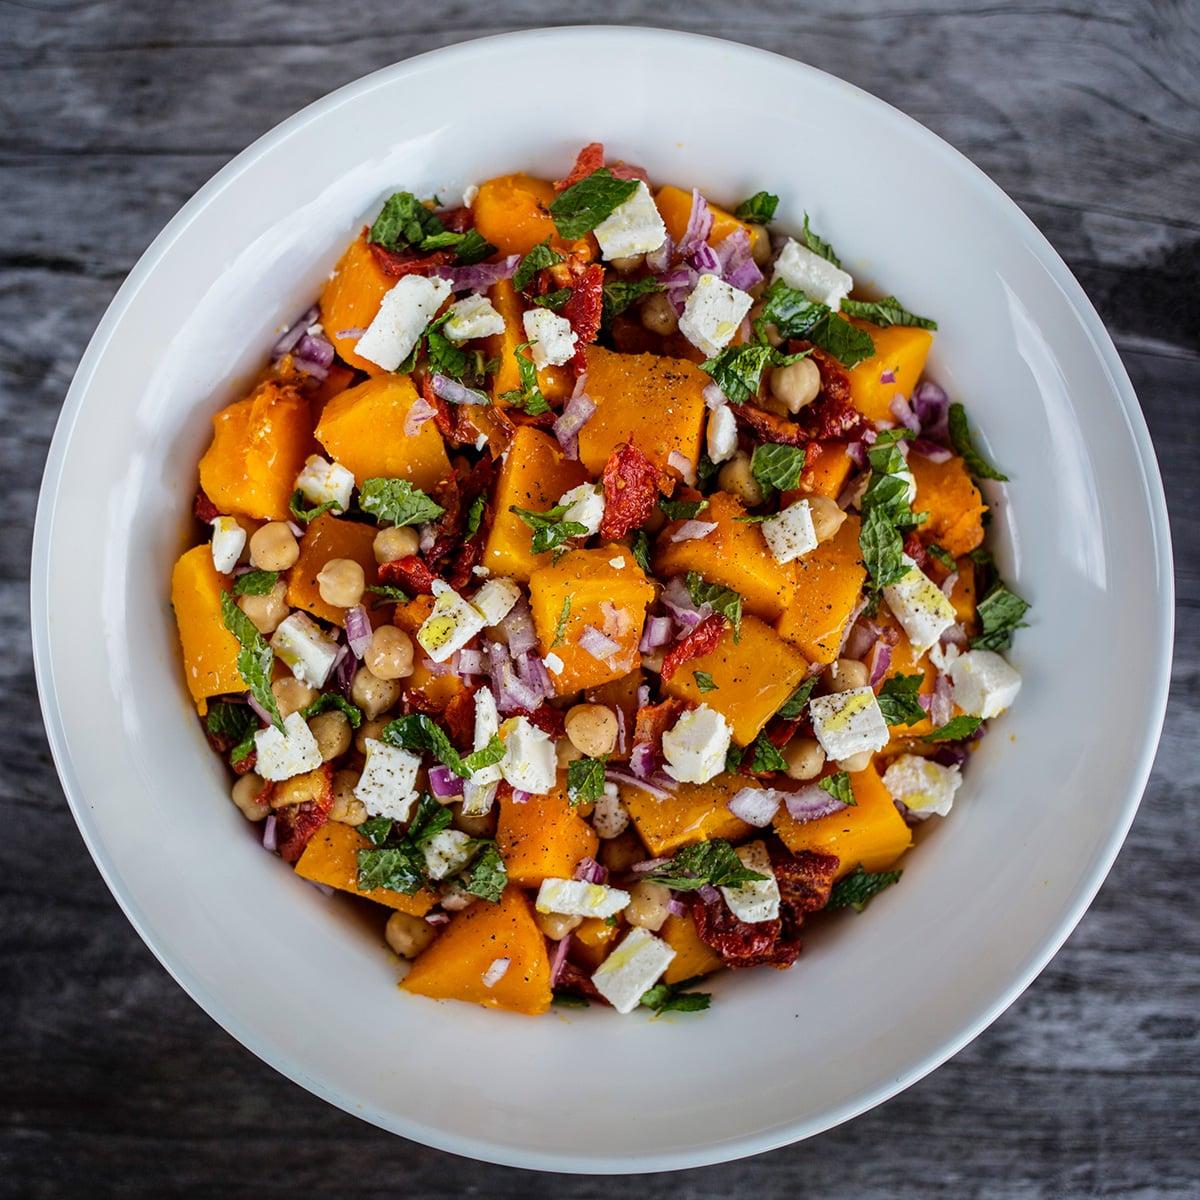 Roasted Pumpkin, Chickpea and Sundried Tomato Salad with Goats Feta